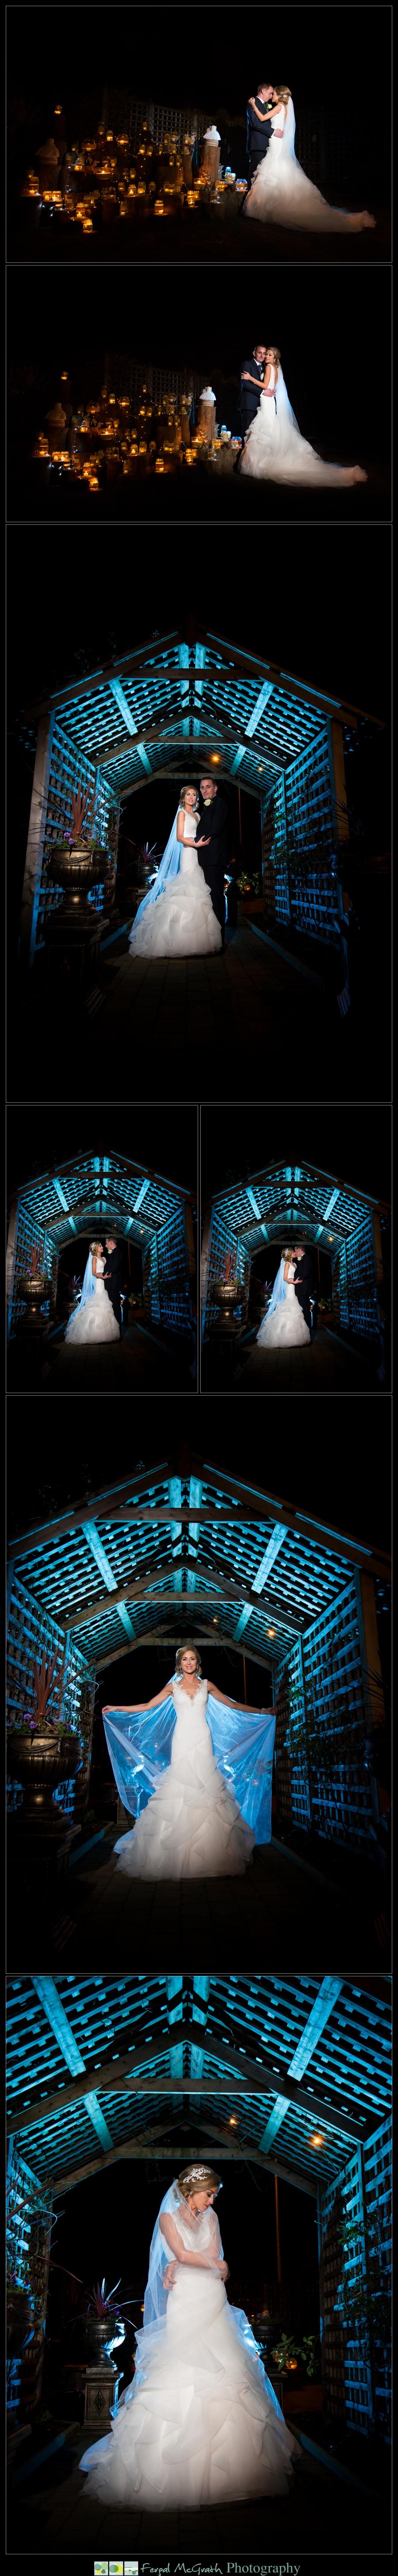 Silver Tassie Hotel Christmas Wedding night time wedding photos